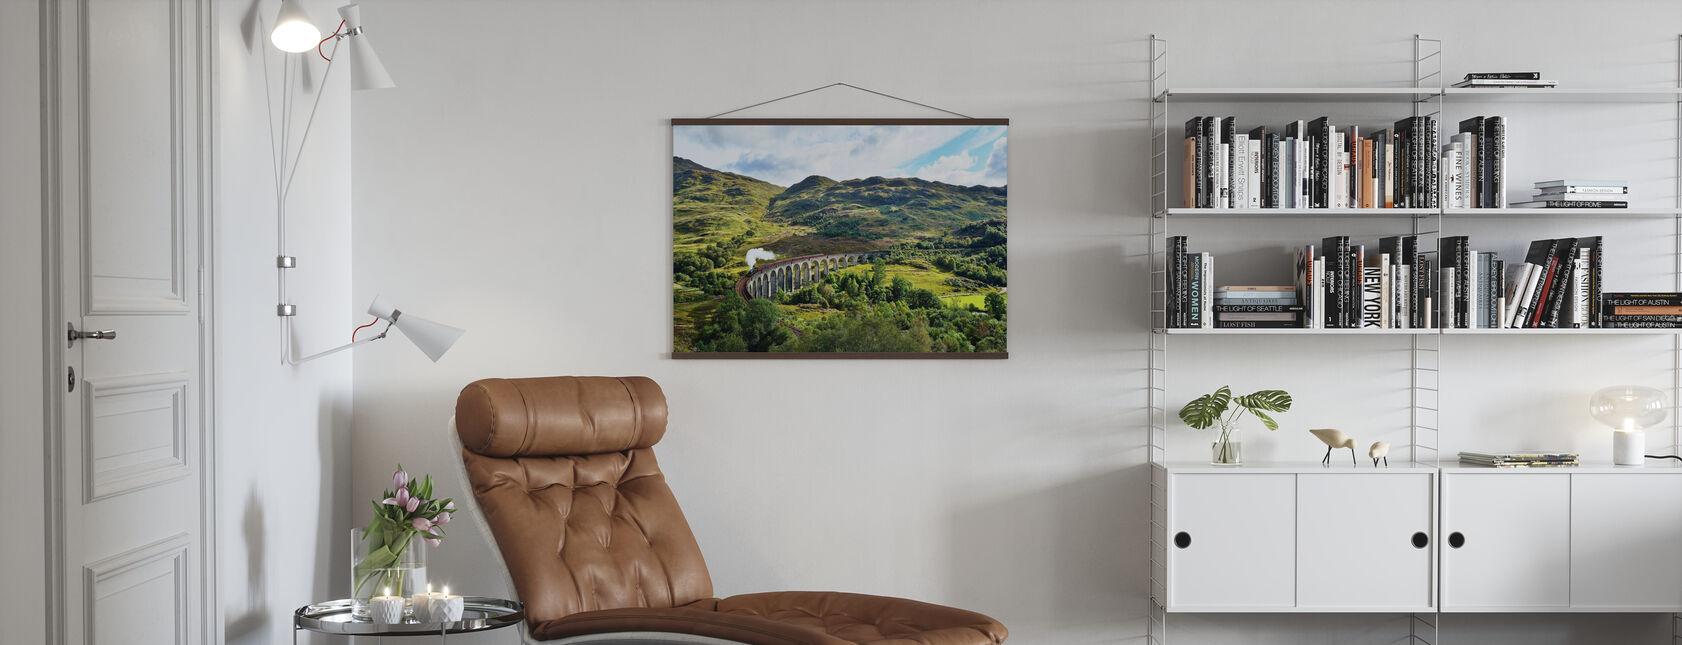 Train at Scotland Highlands - Poster - Living Room